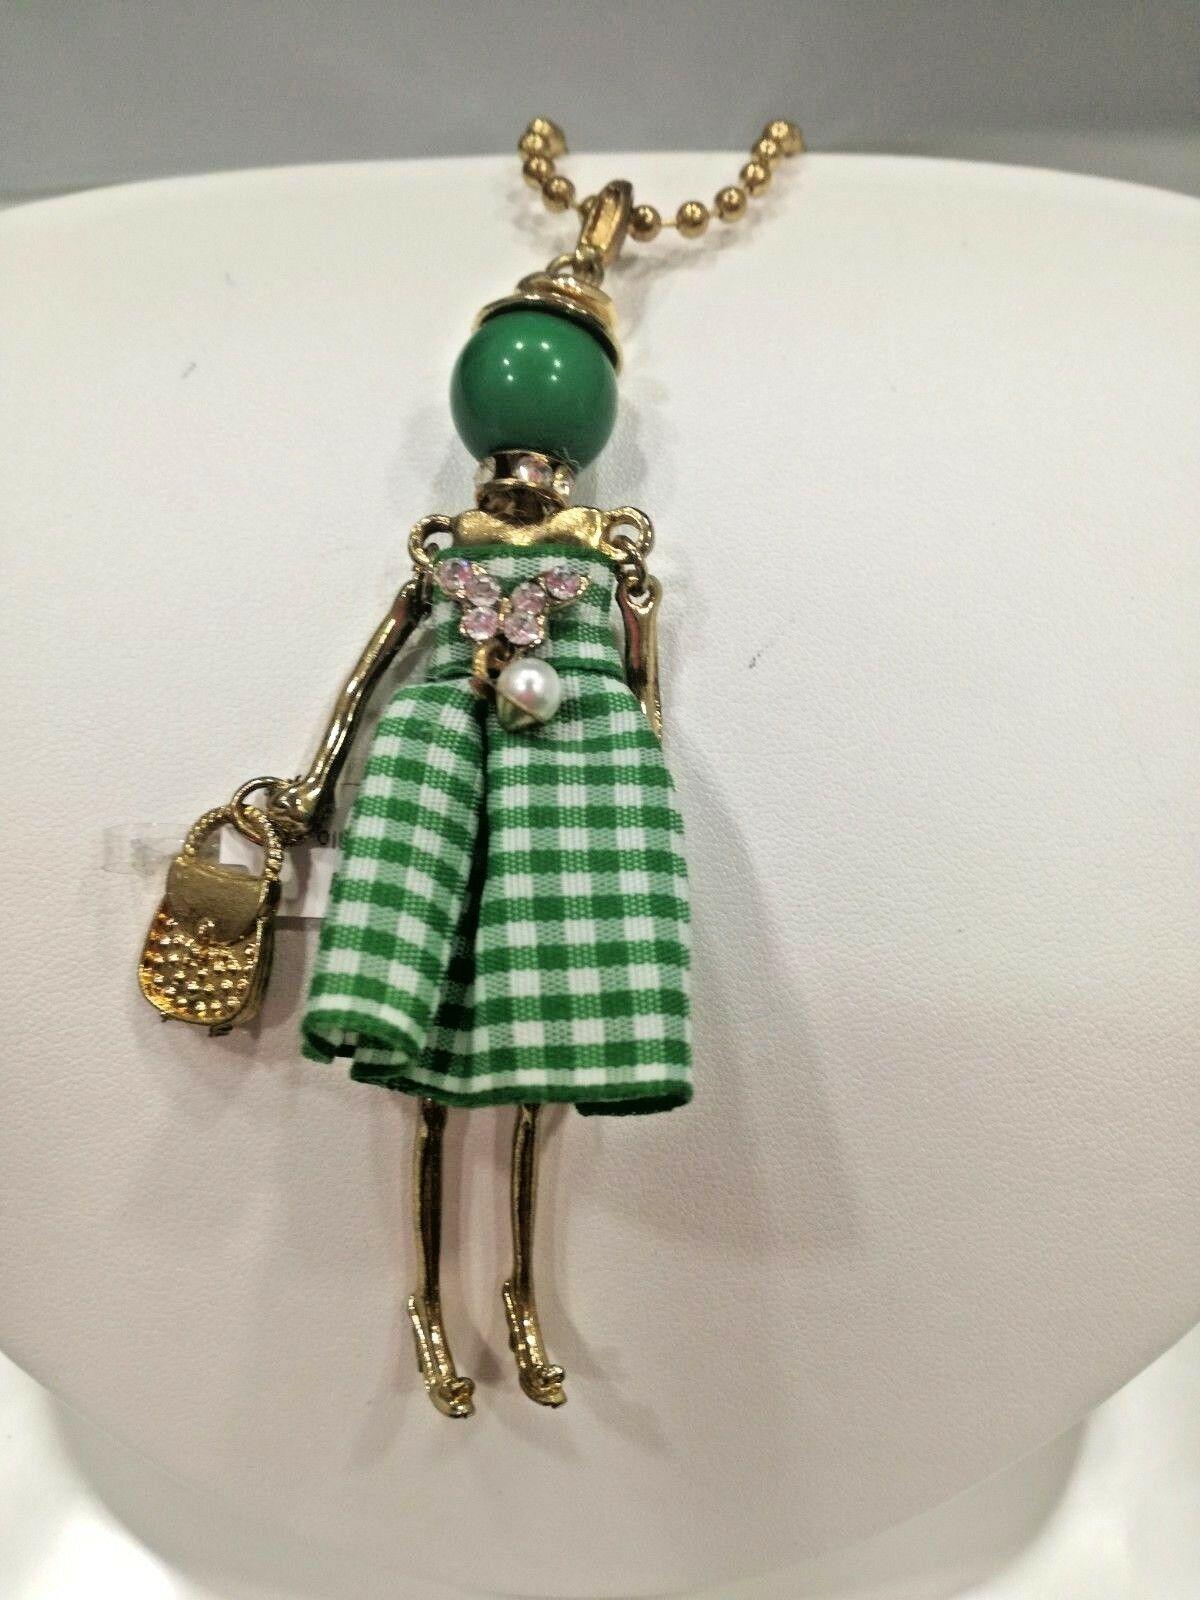 Collana donna con pendente ballerina (verde) Manuel Zed Q2315 LISTINO 30